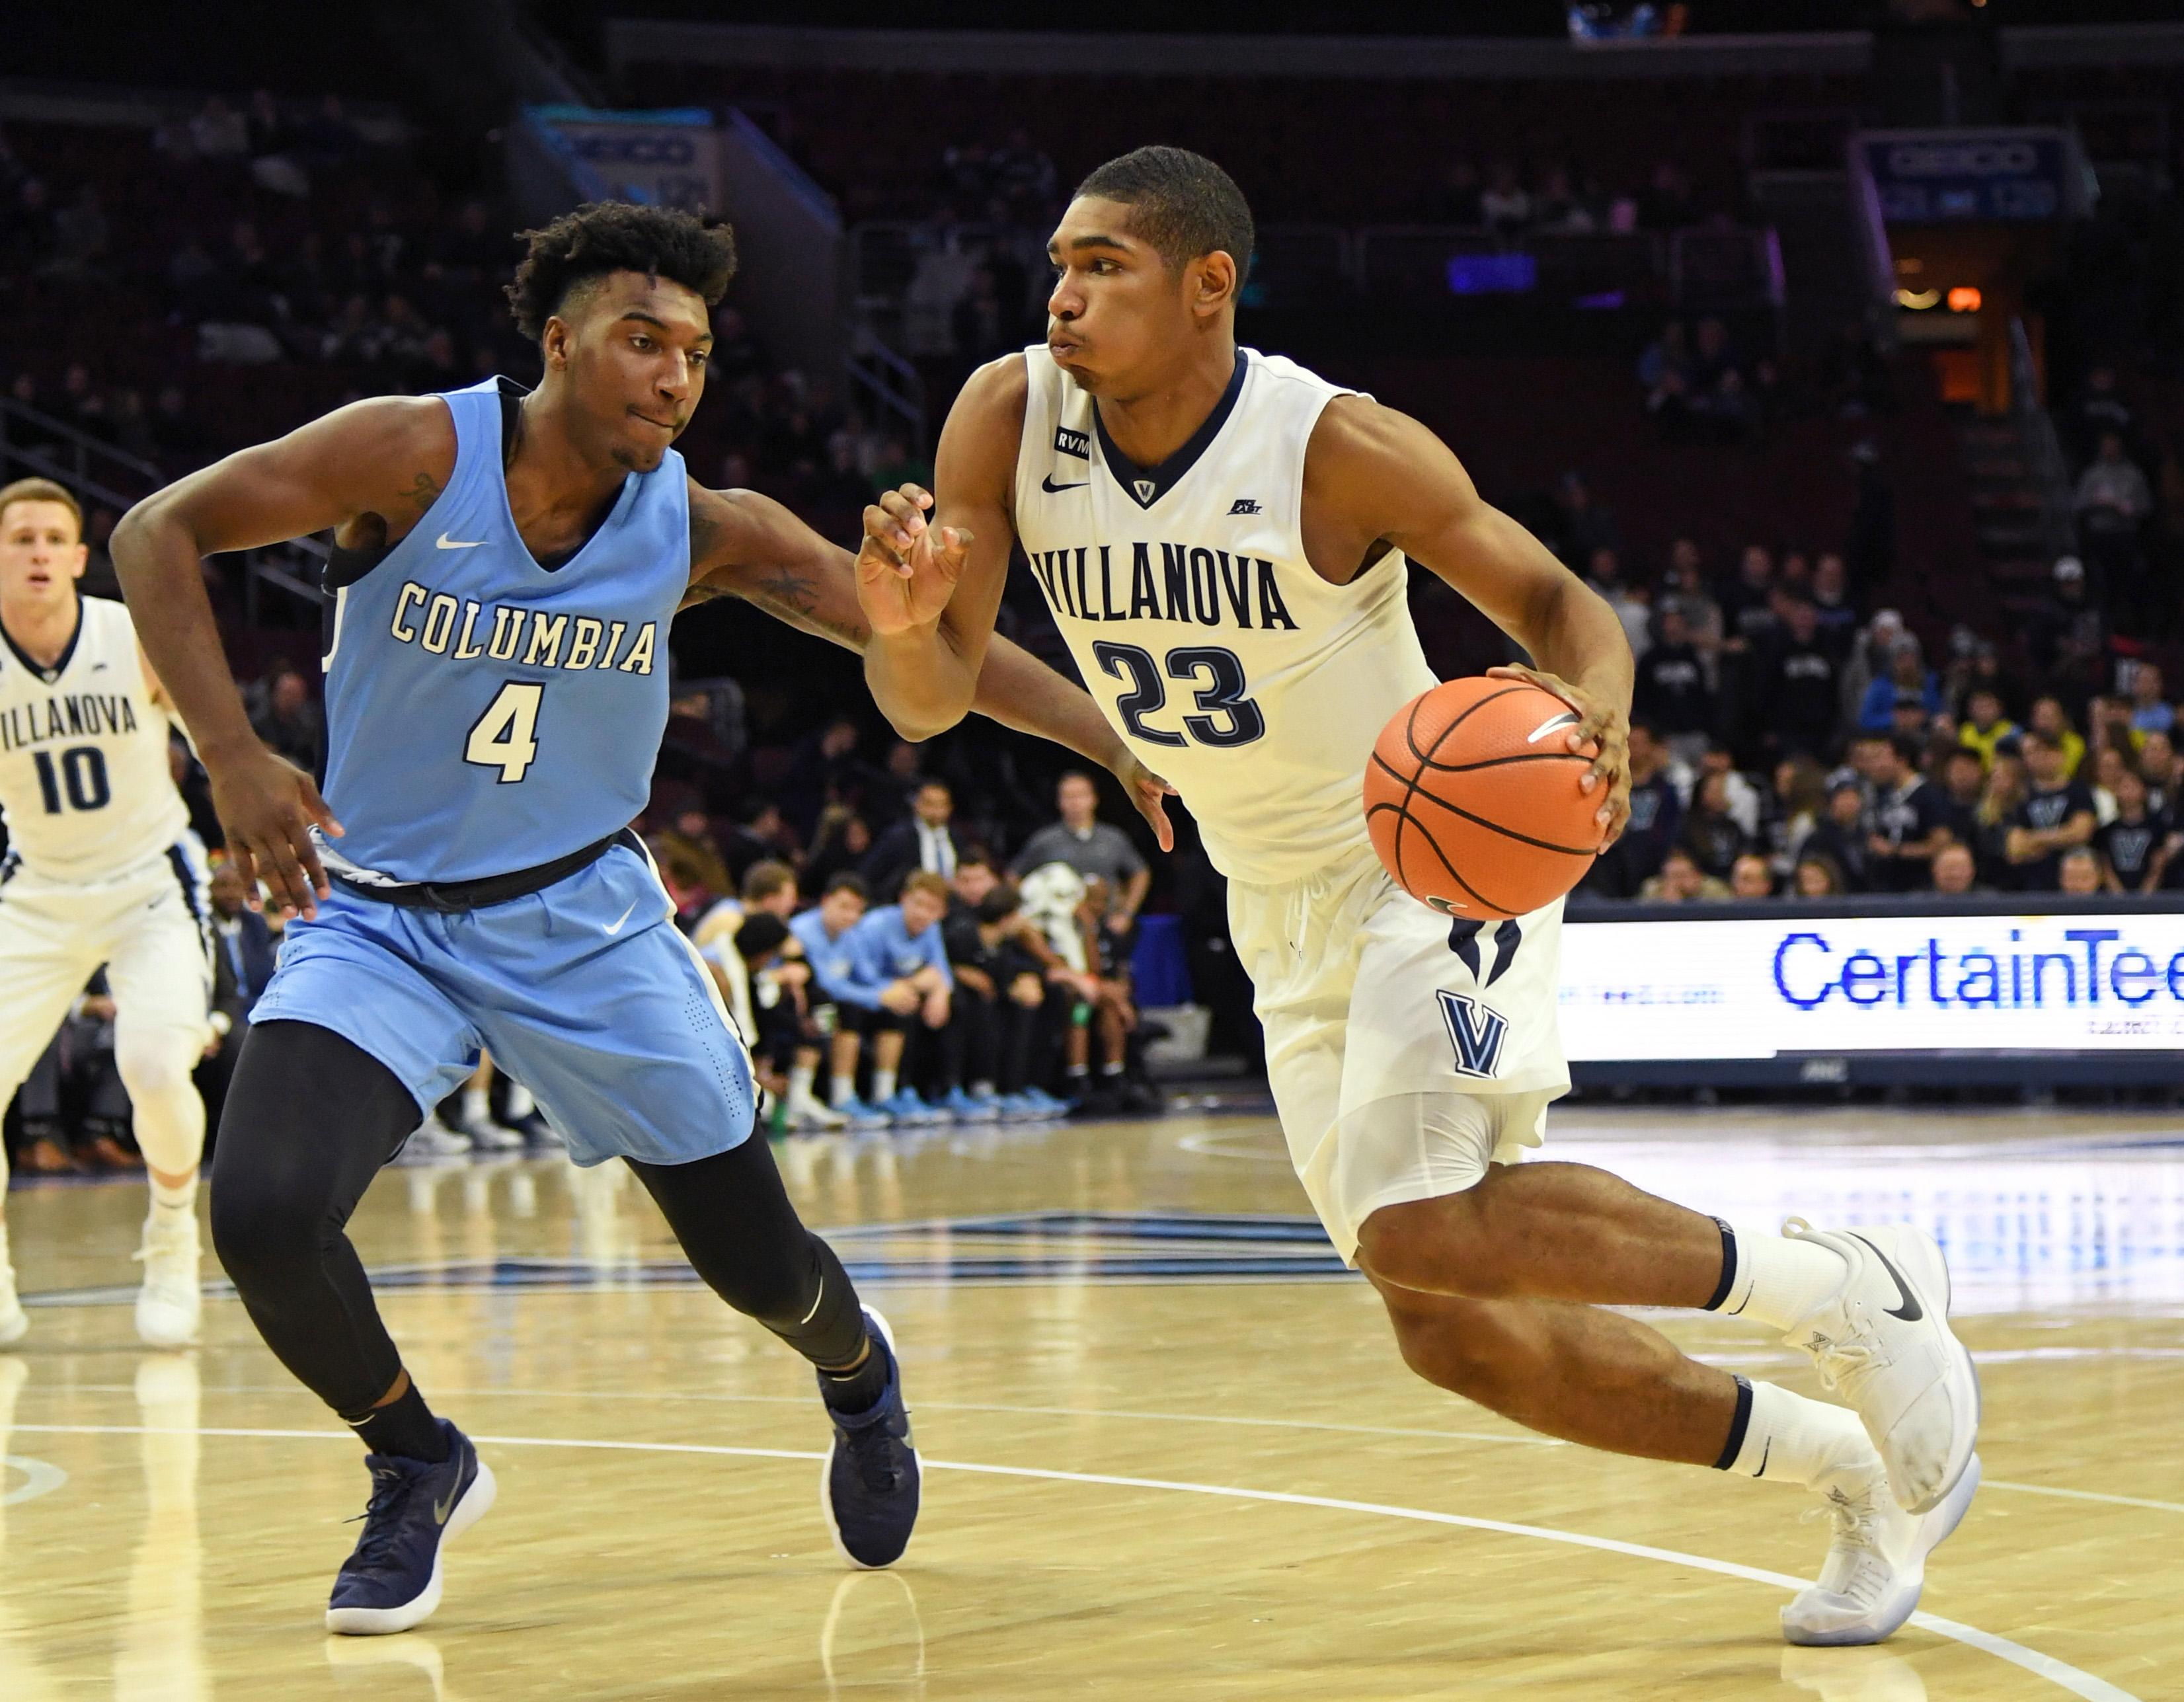 NCAA Basketball: Columbia at Villanova